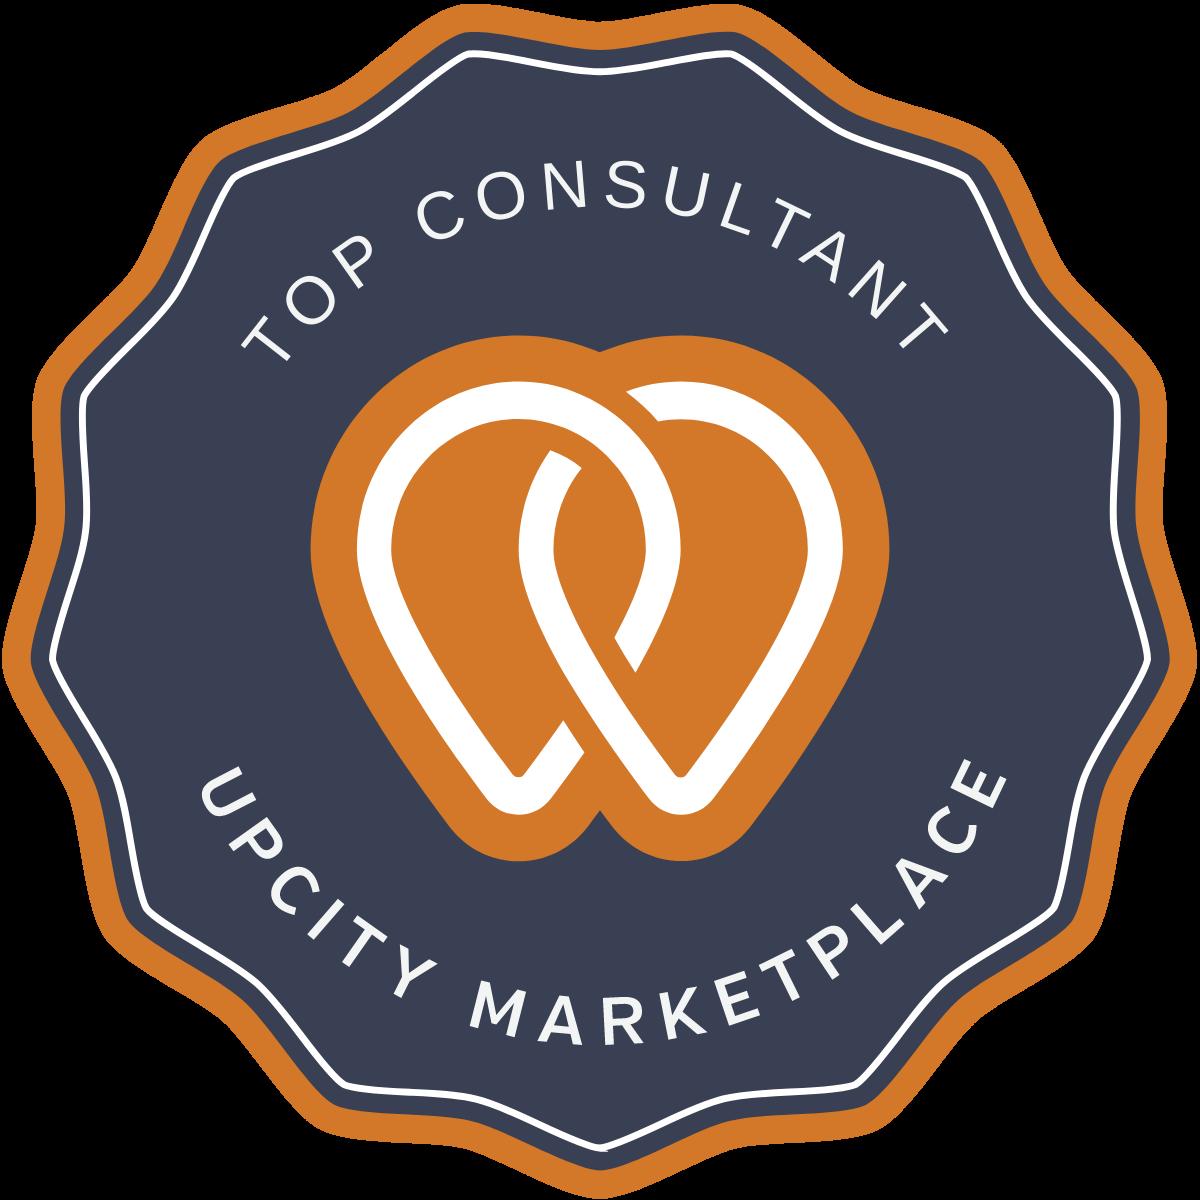 upcity marketing